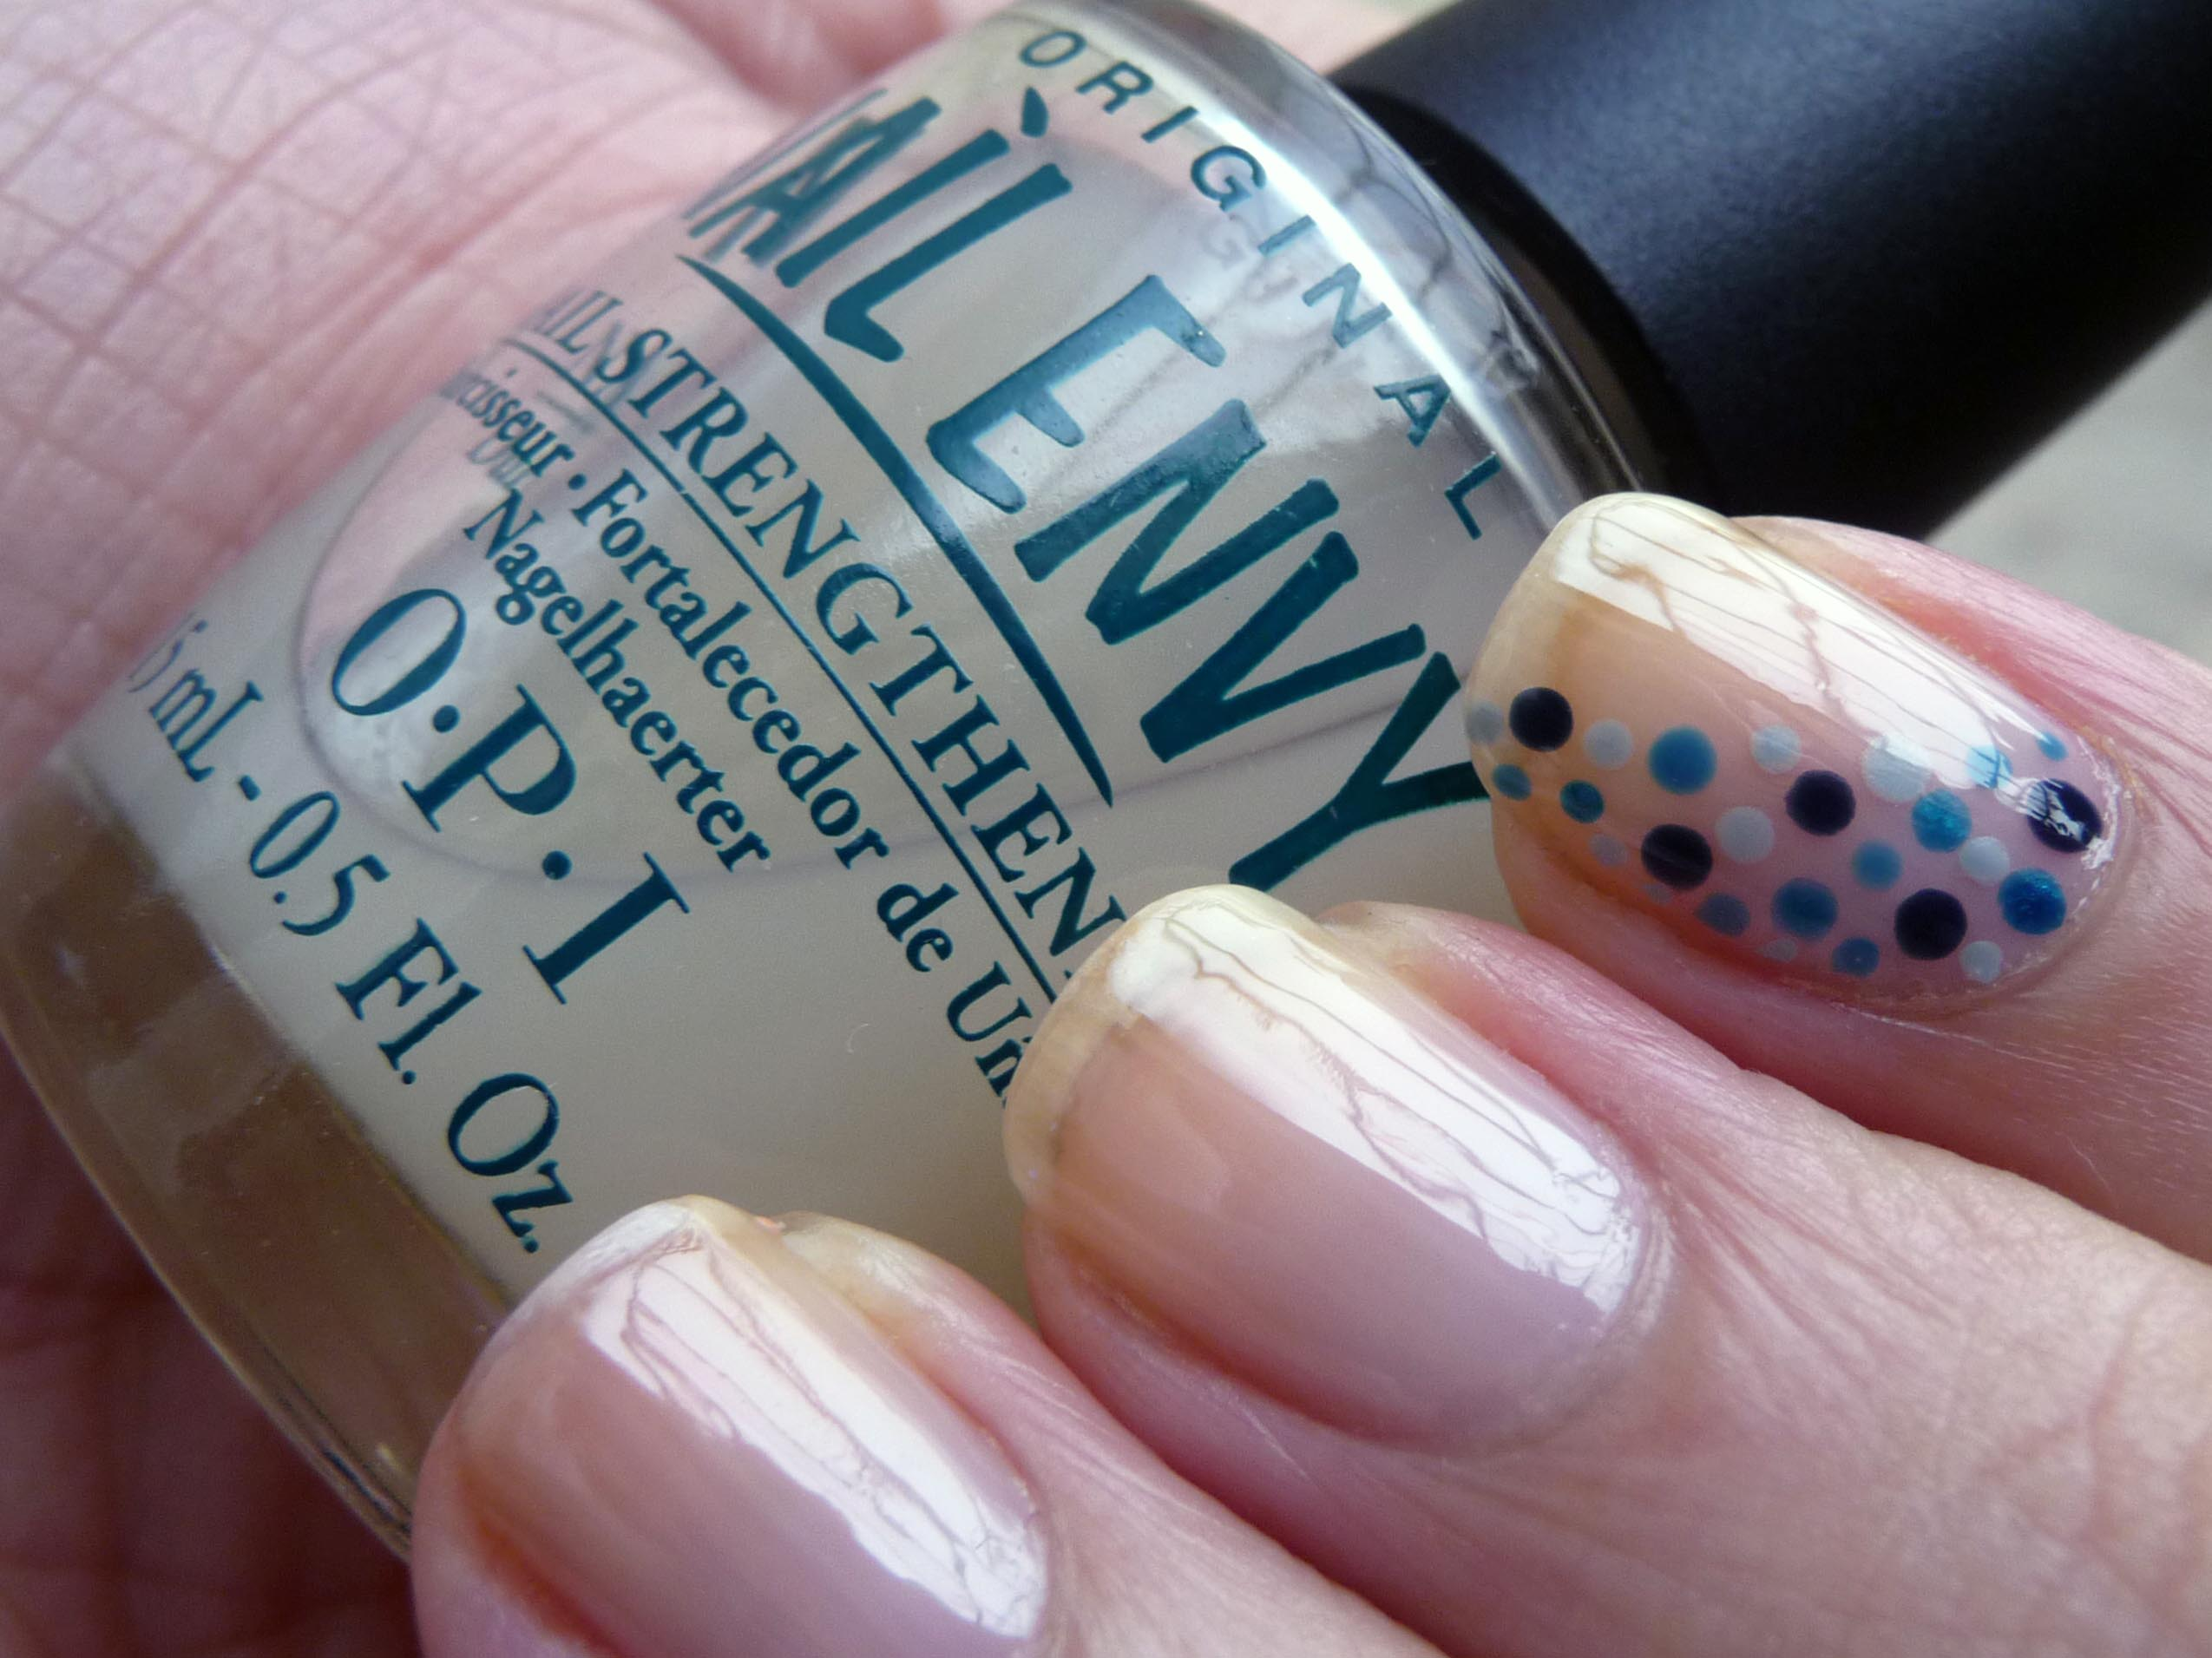 a la rescousse de mes ongles cass s original nail envy. Black Bedroom Furniture Sets. Home Design Ideas